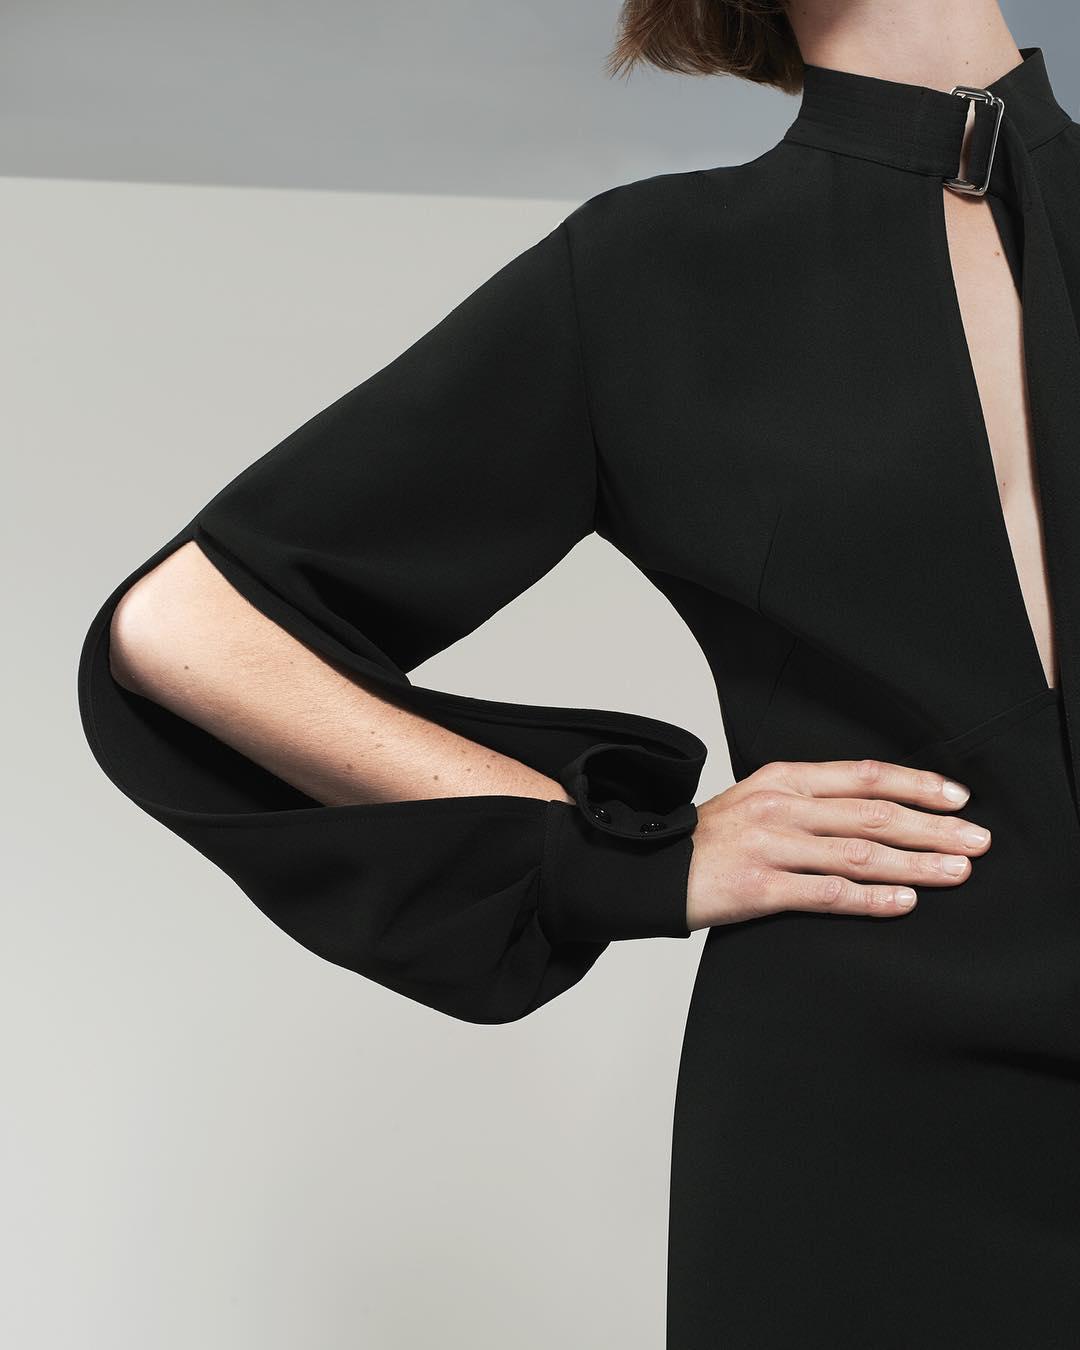 Bell Sleeve Midi Dress By Victoria Beckham 2021